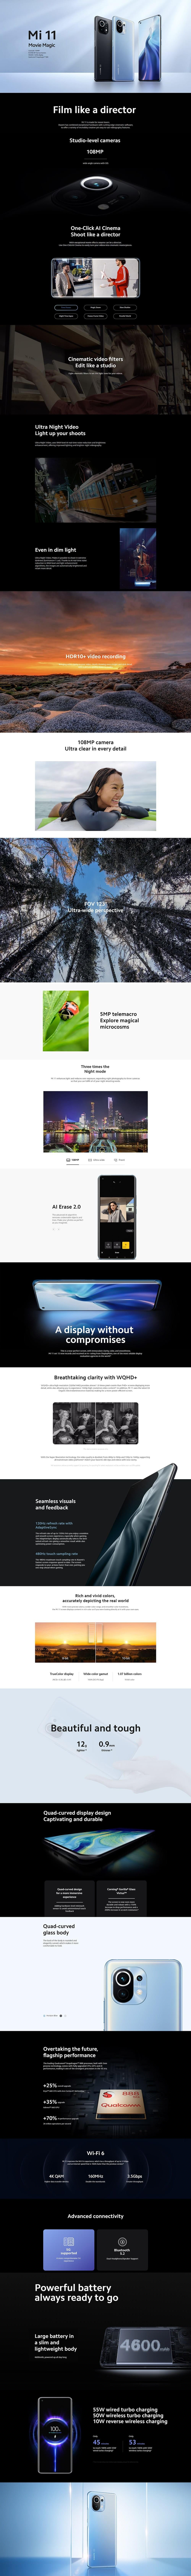 01-3000090420-feature.jpg